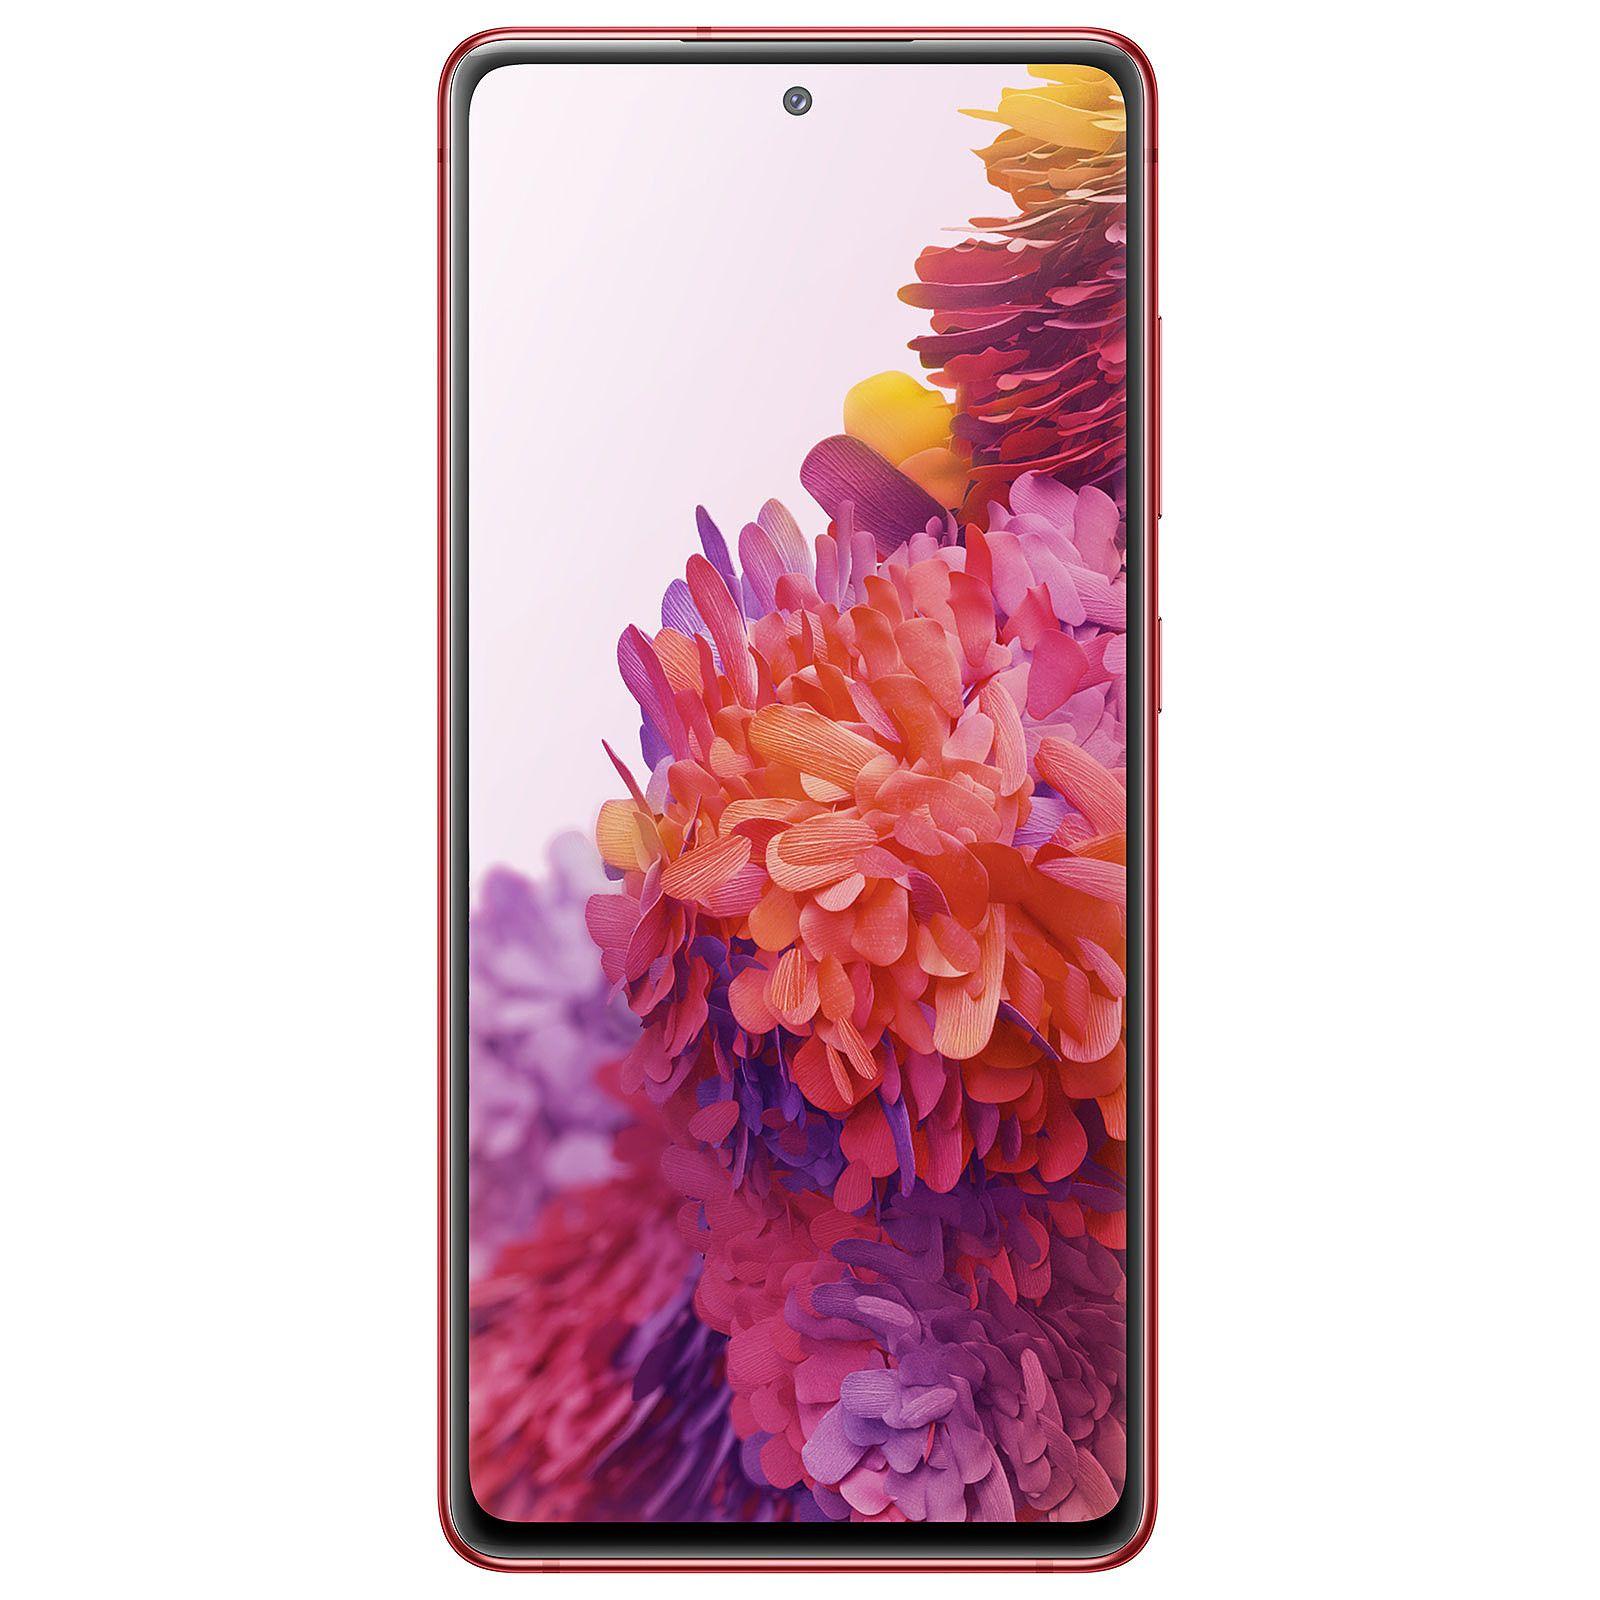 "Samsung Galaxy S20 FE 5G 128/6GB (Snapdragon 865, 6.5"" 120Hz Amoled Display, 4500mAh Akku, Wireless Charging, IP68 Wasserdicht, NFC)"